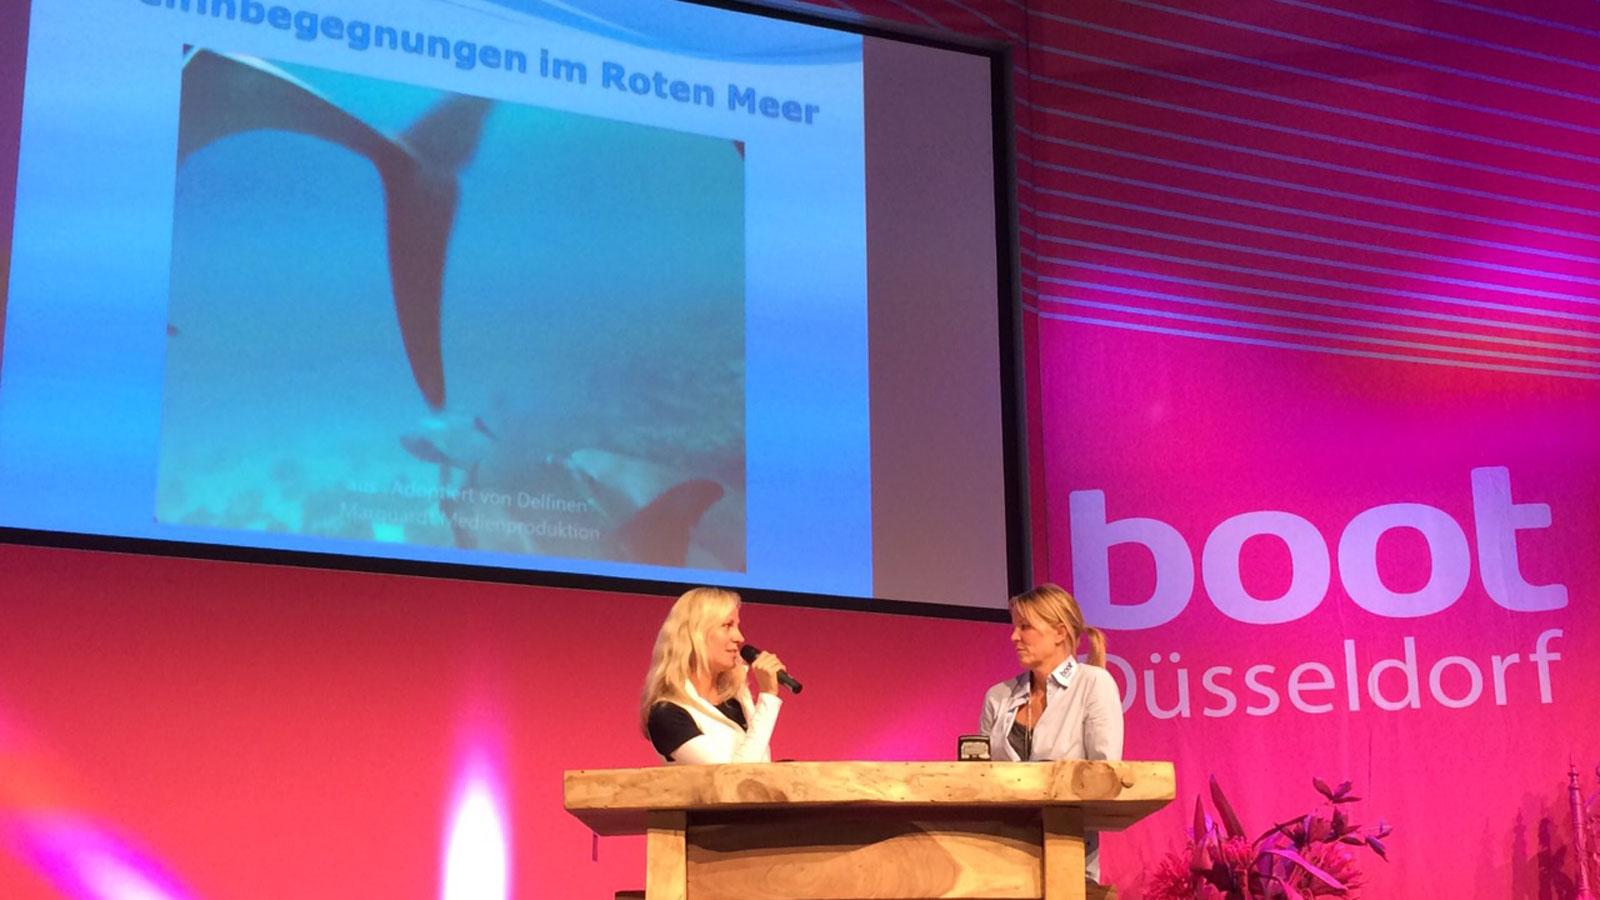 Vortrag Delfinbegegnungen im Roten Meer